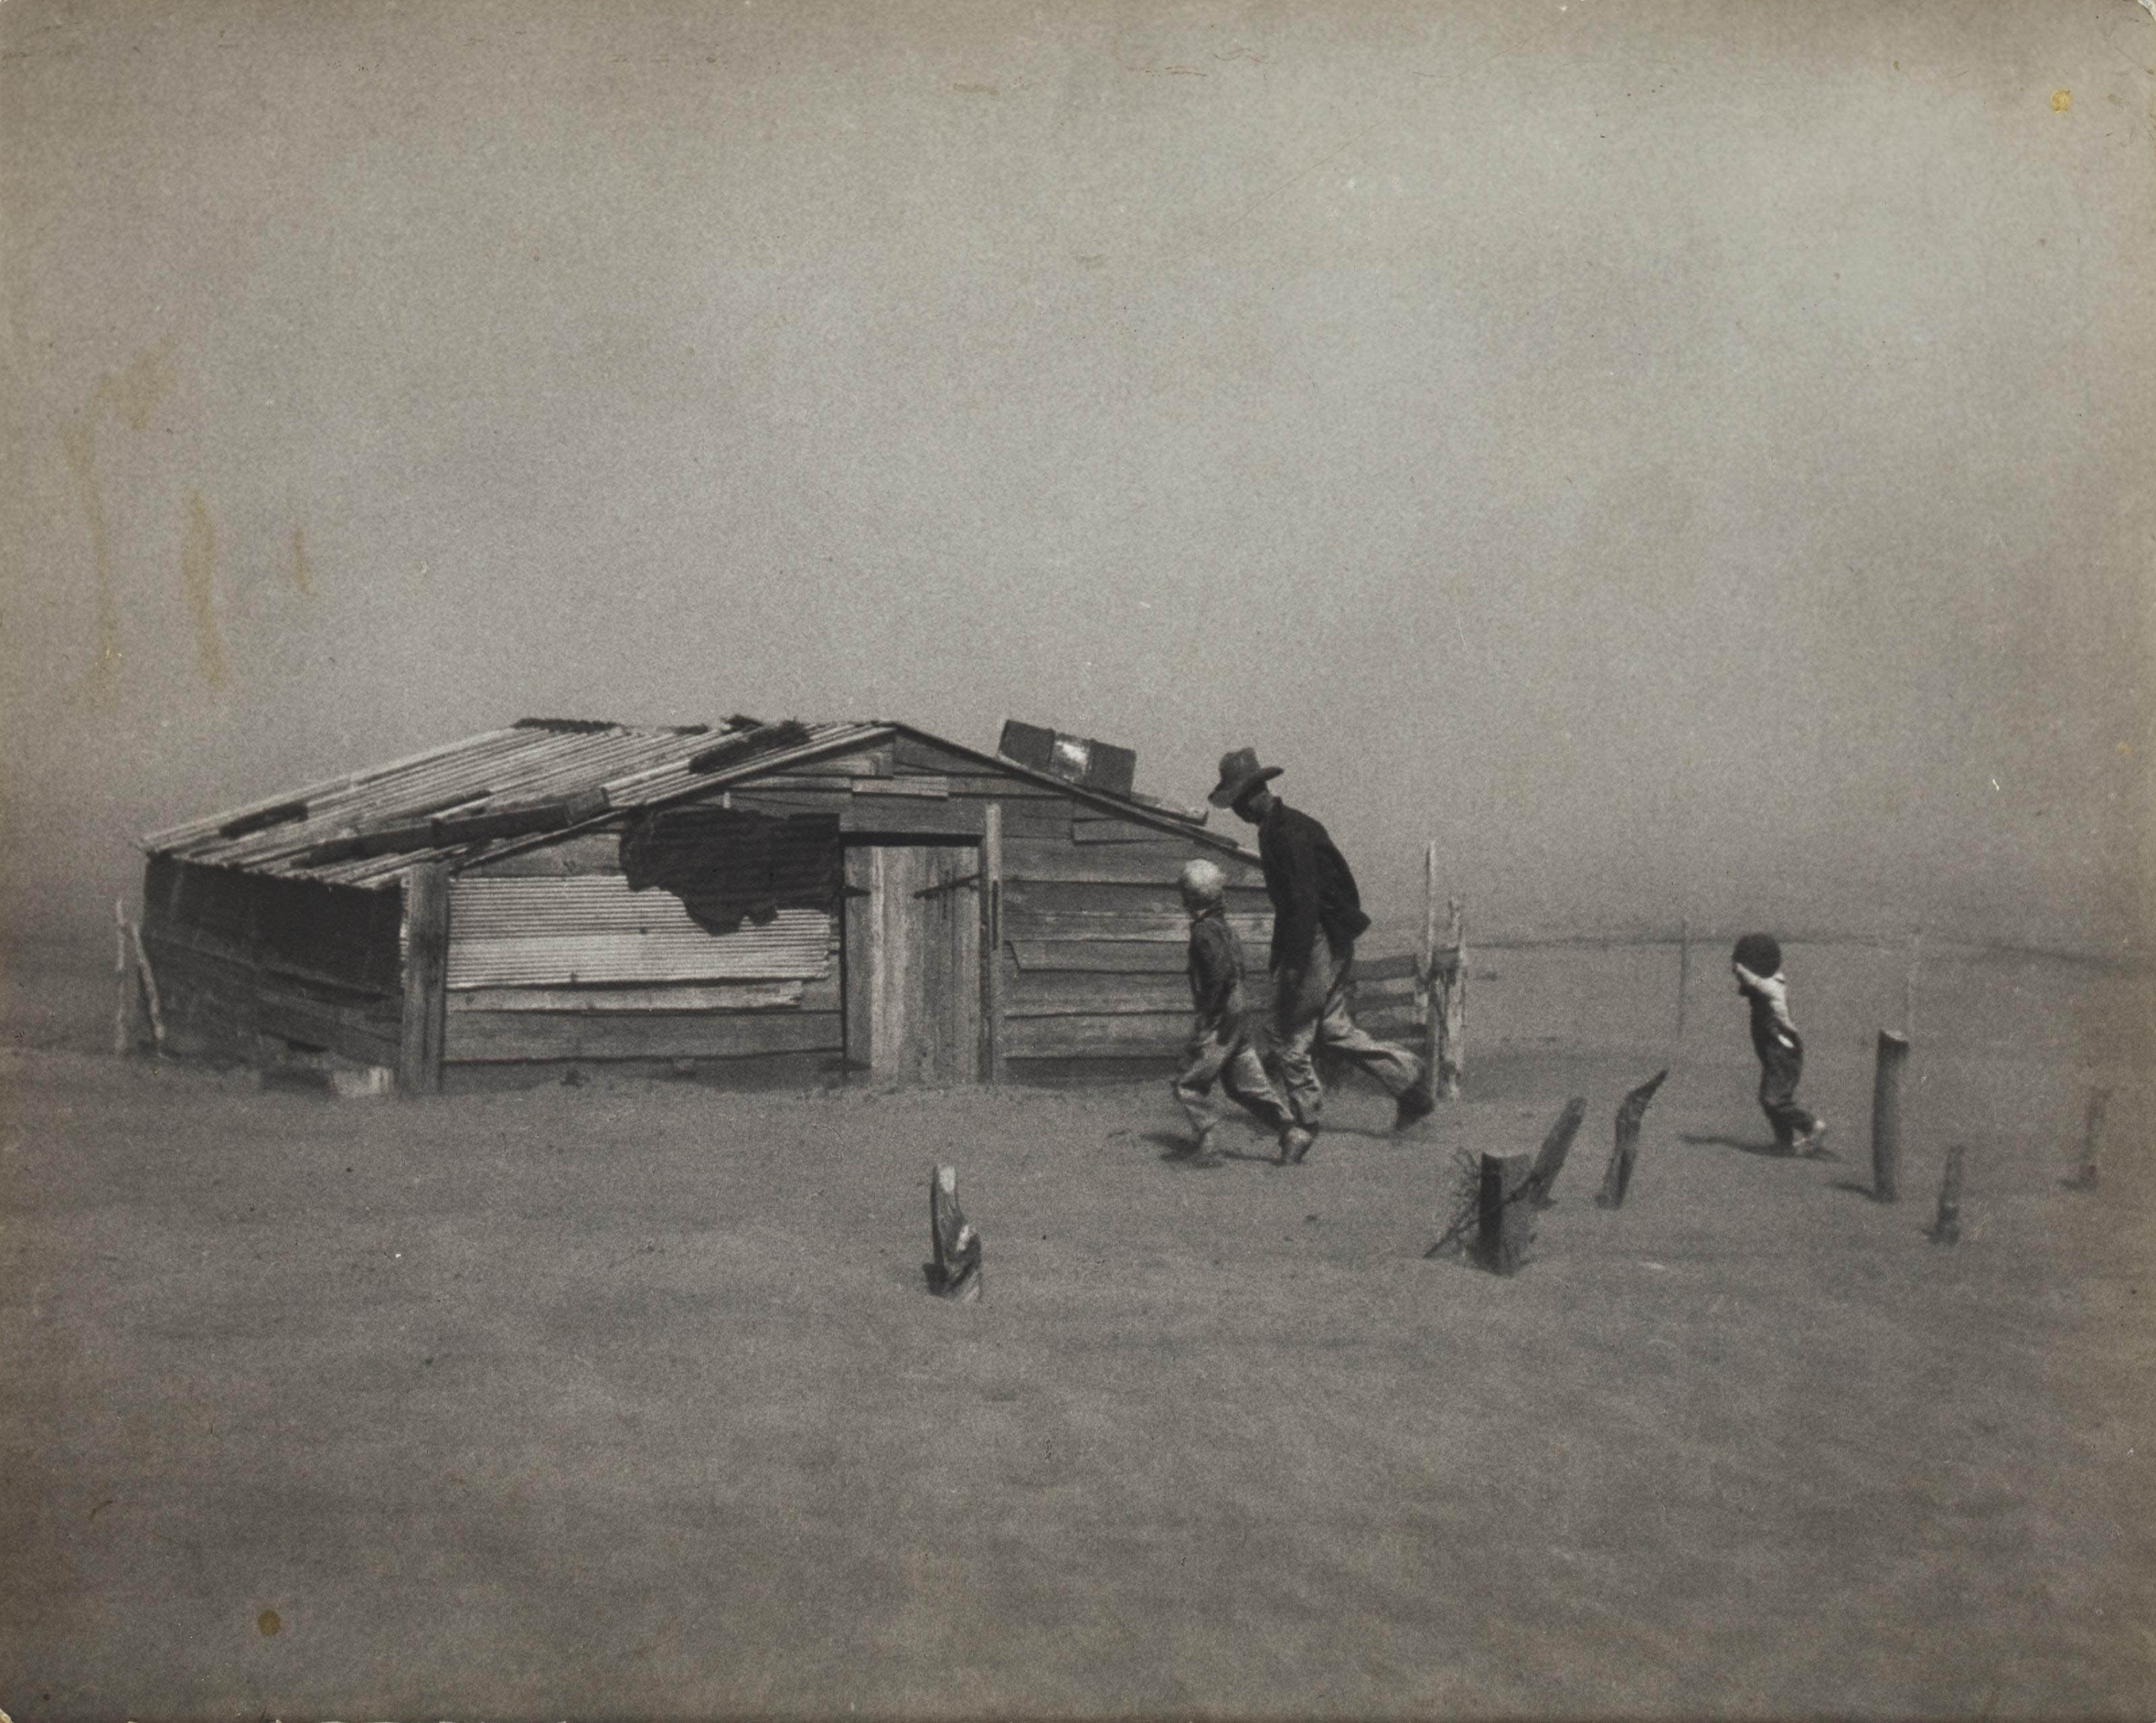 Dust Storm, Cimarron County, Oklahoma, 1939